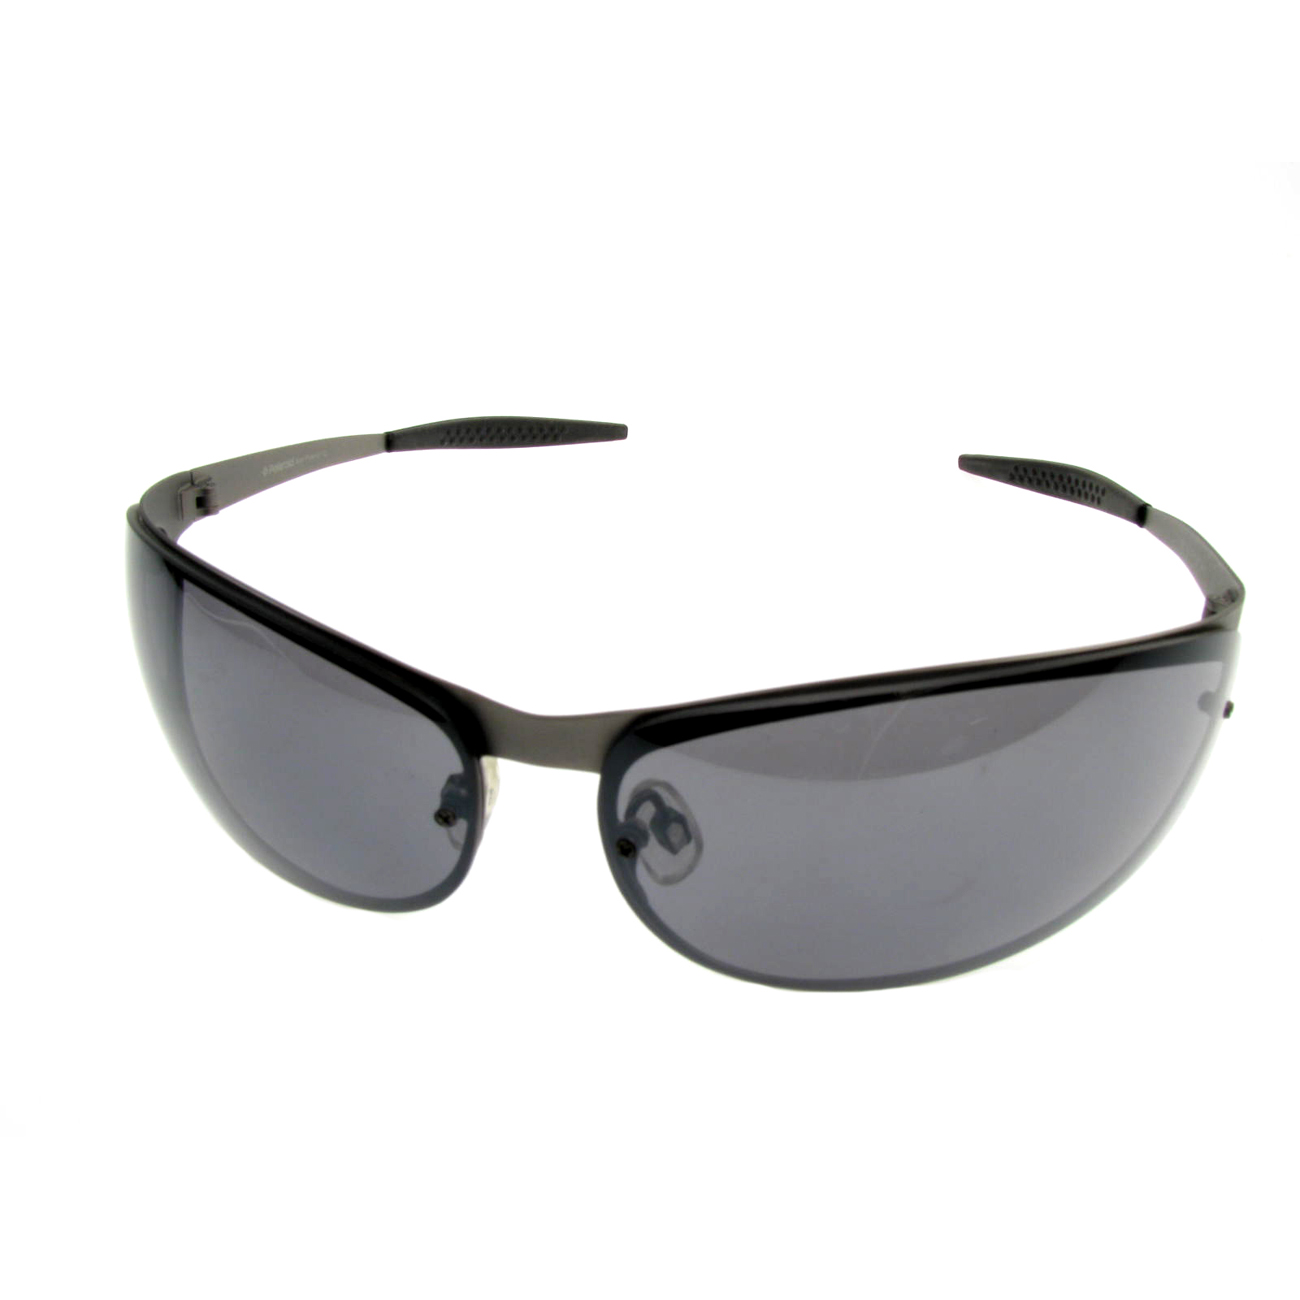 f48ddbe4be Original Polaroid Sunglasses 7401A Cat 3 on PopScreen